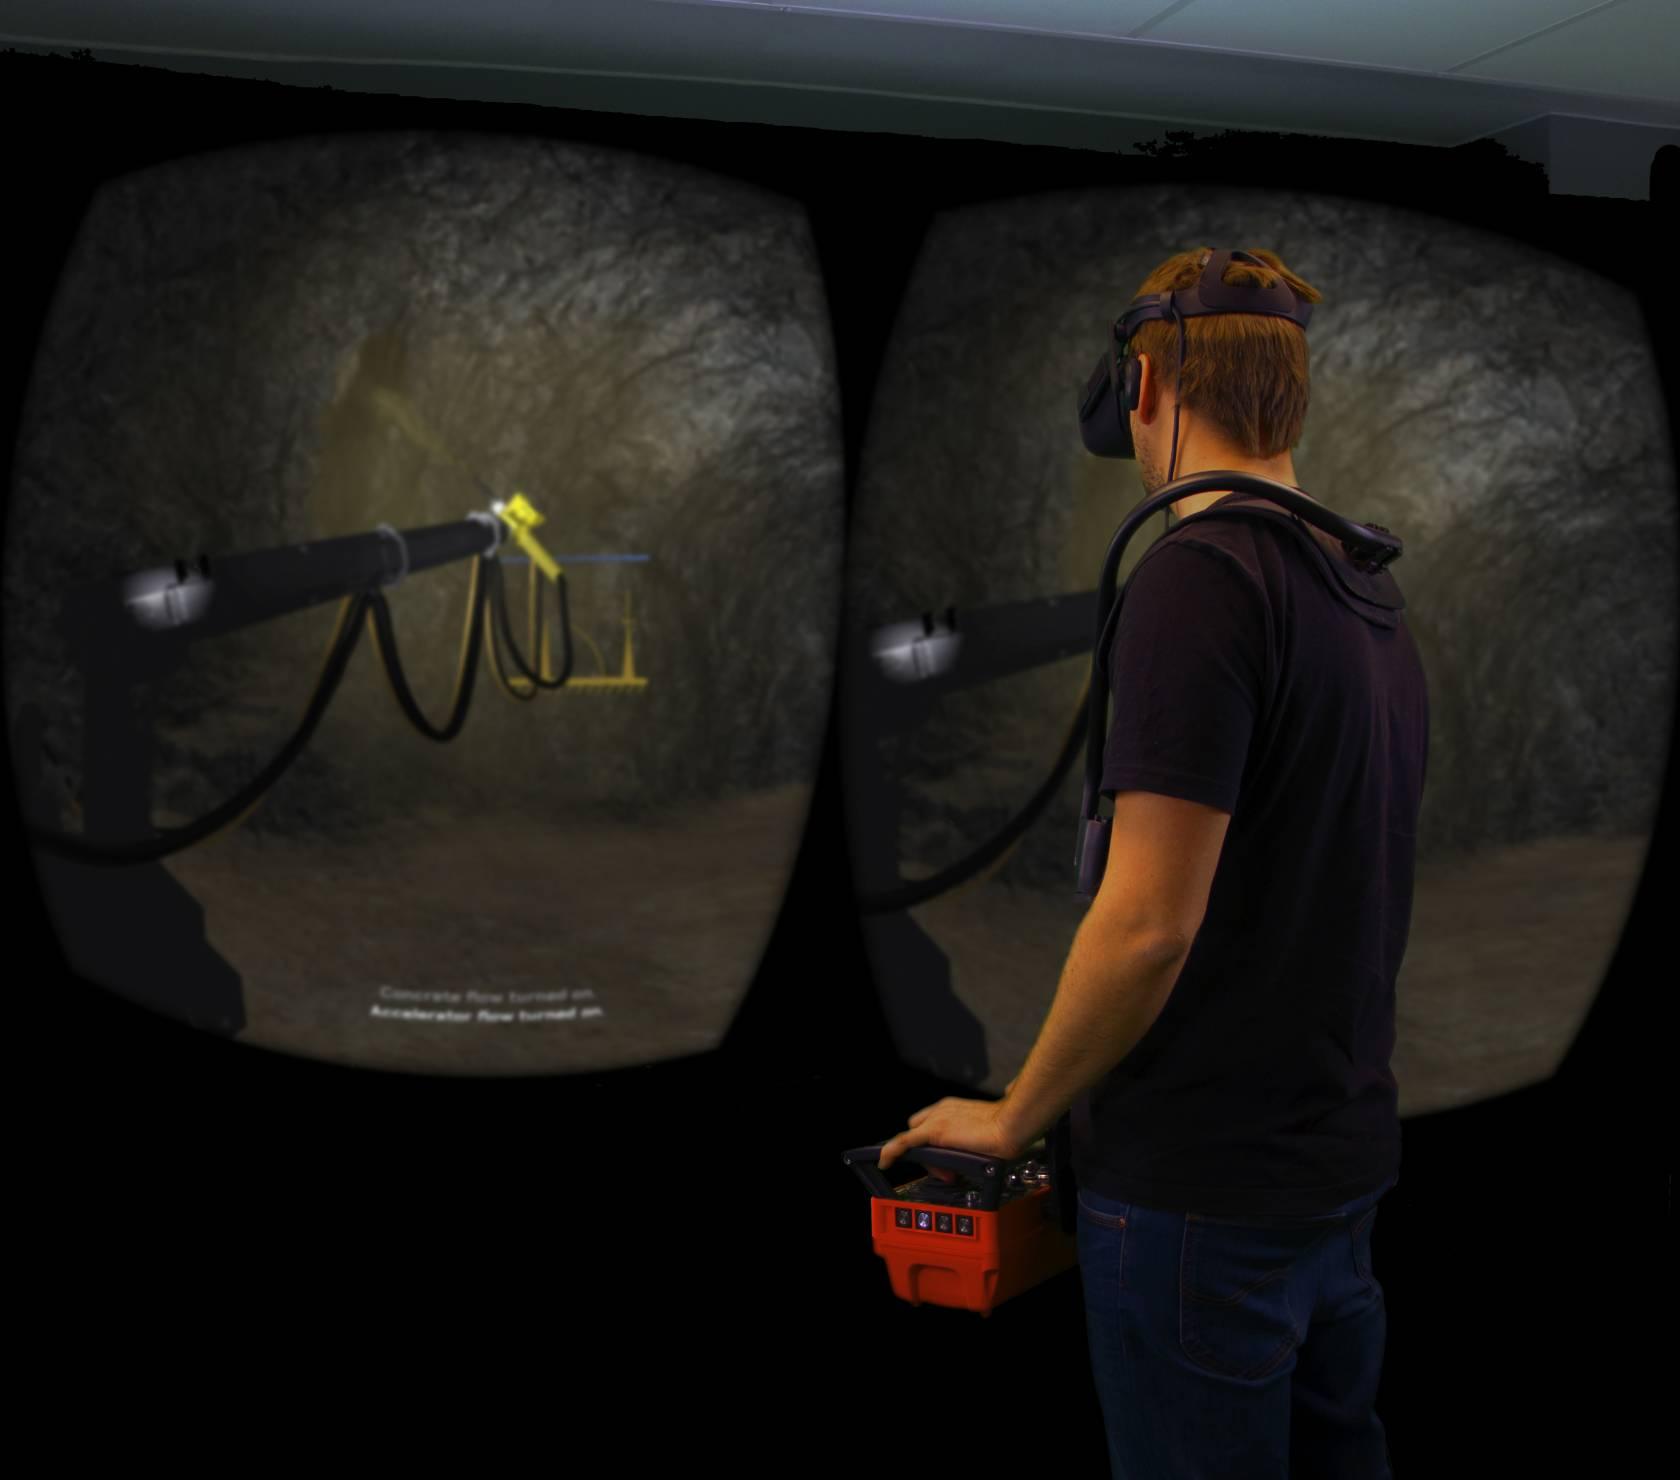 Edvirt's product the VR Shotcrete Simulator_1